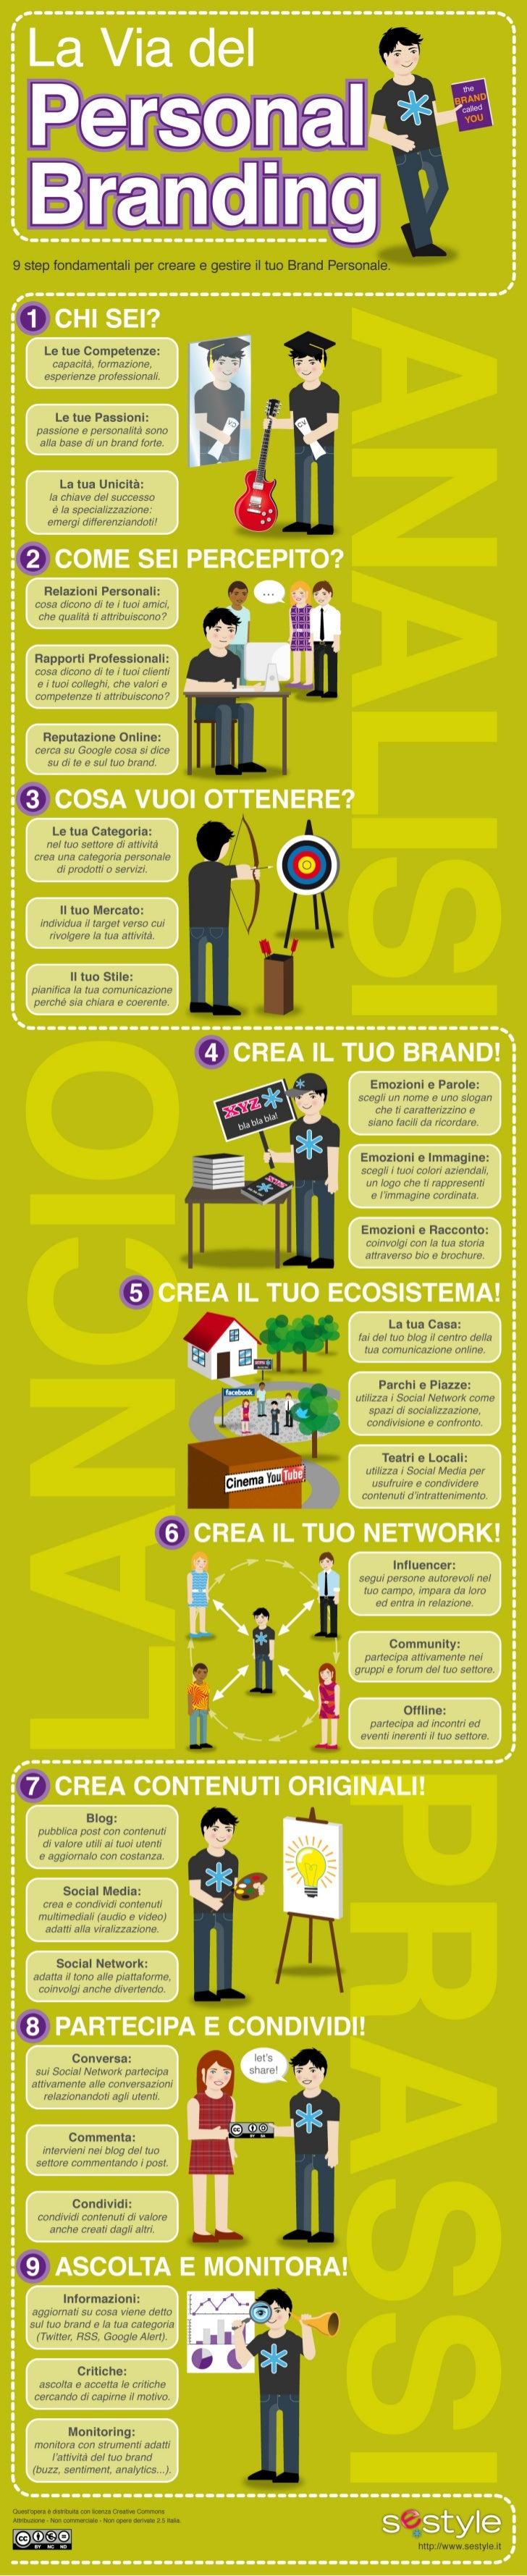 La Via del Personal Branding [Infografica]